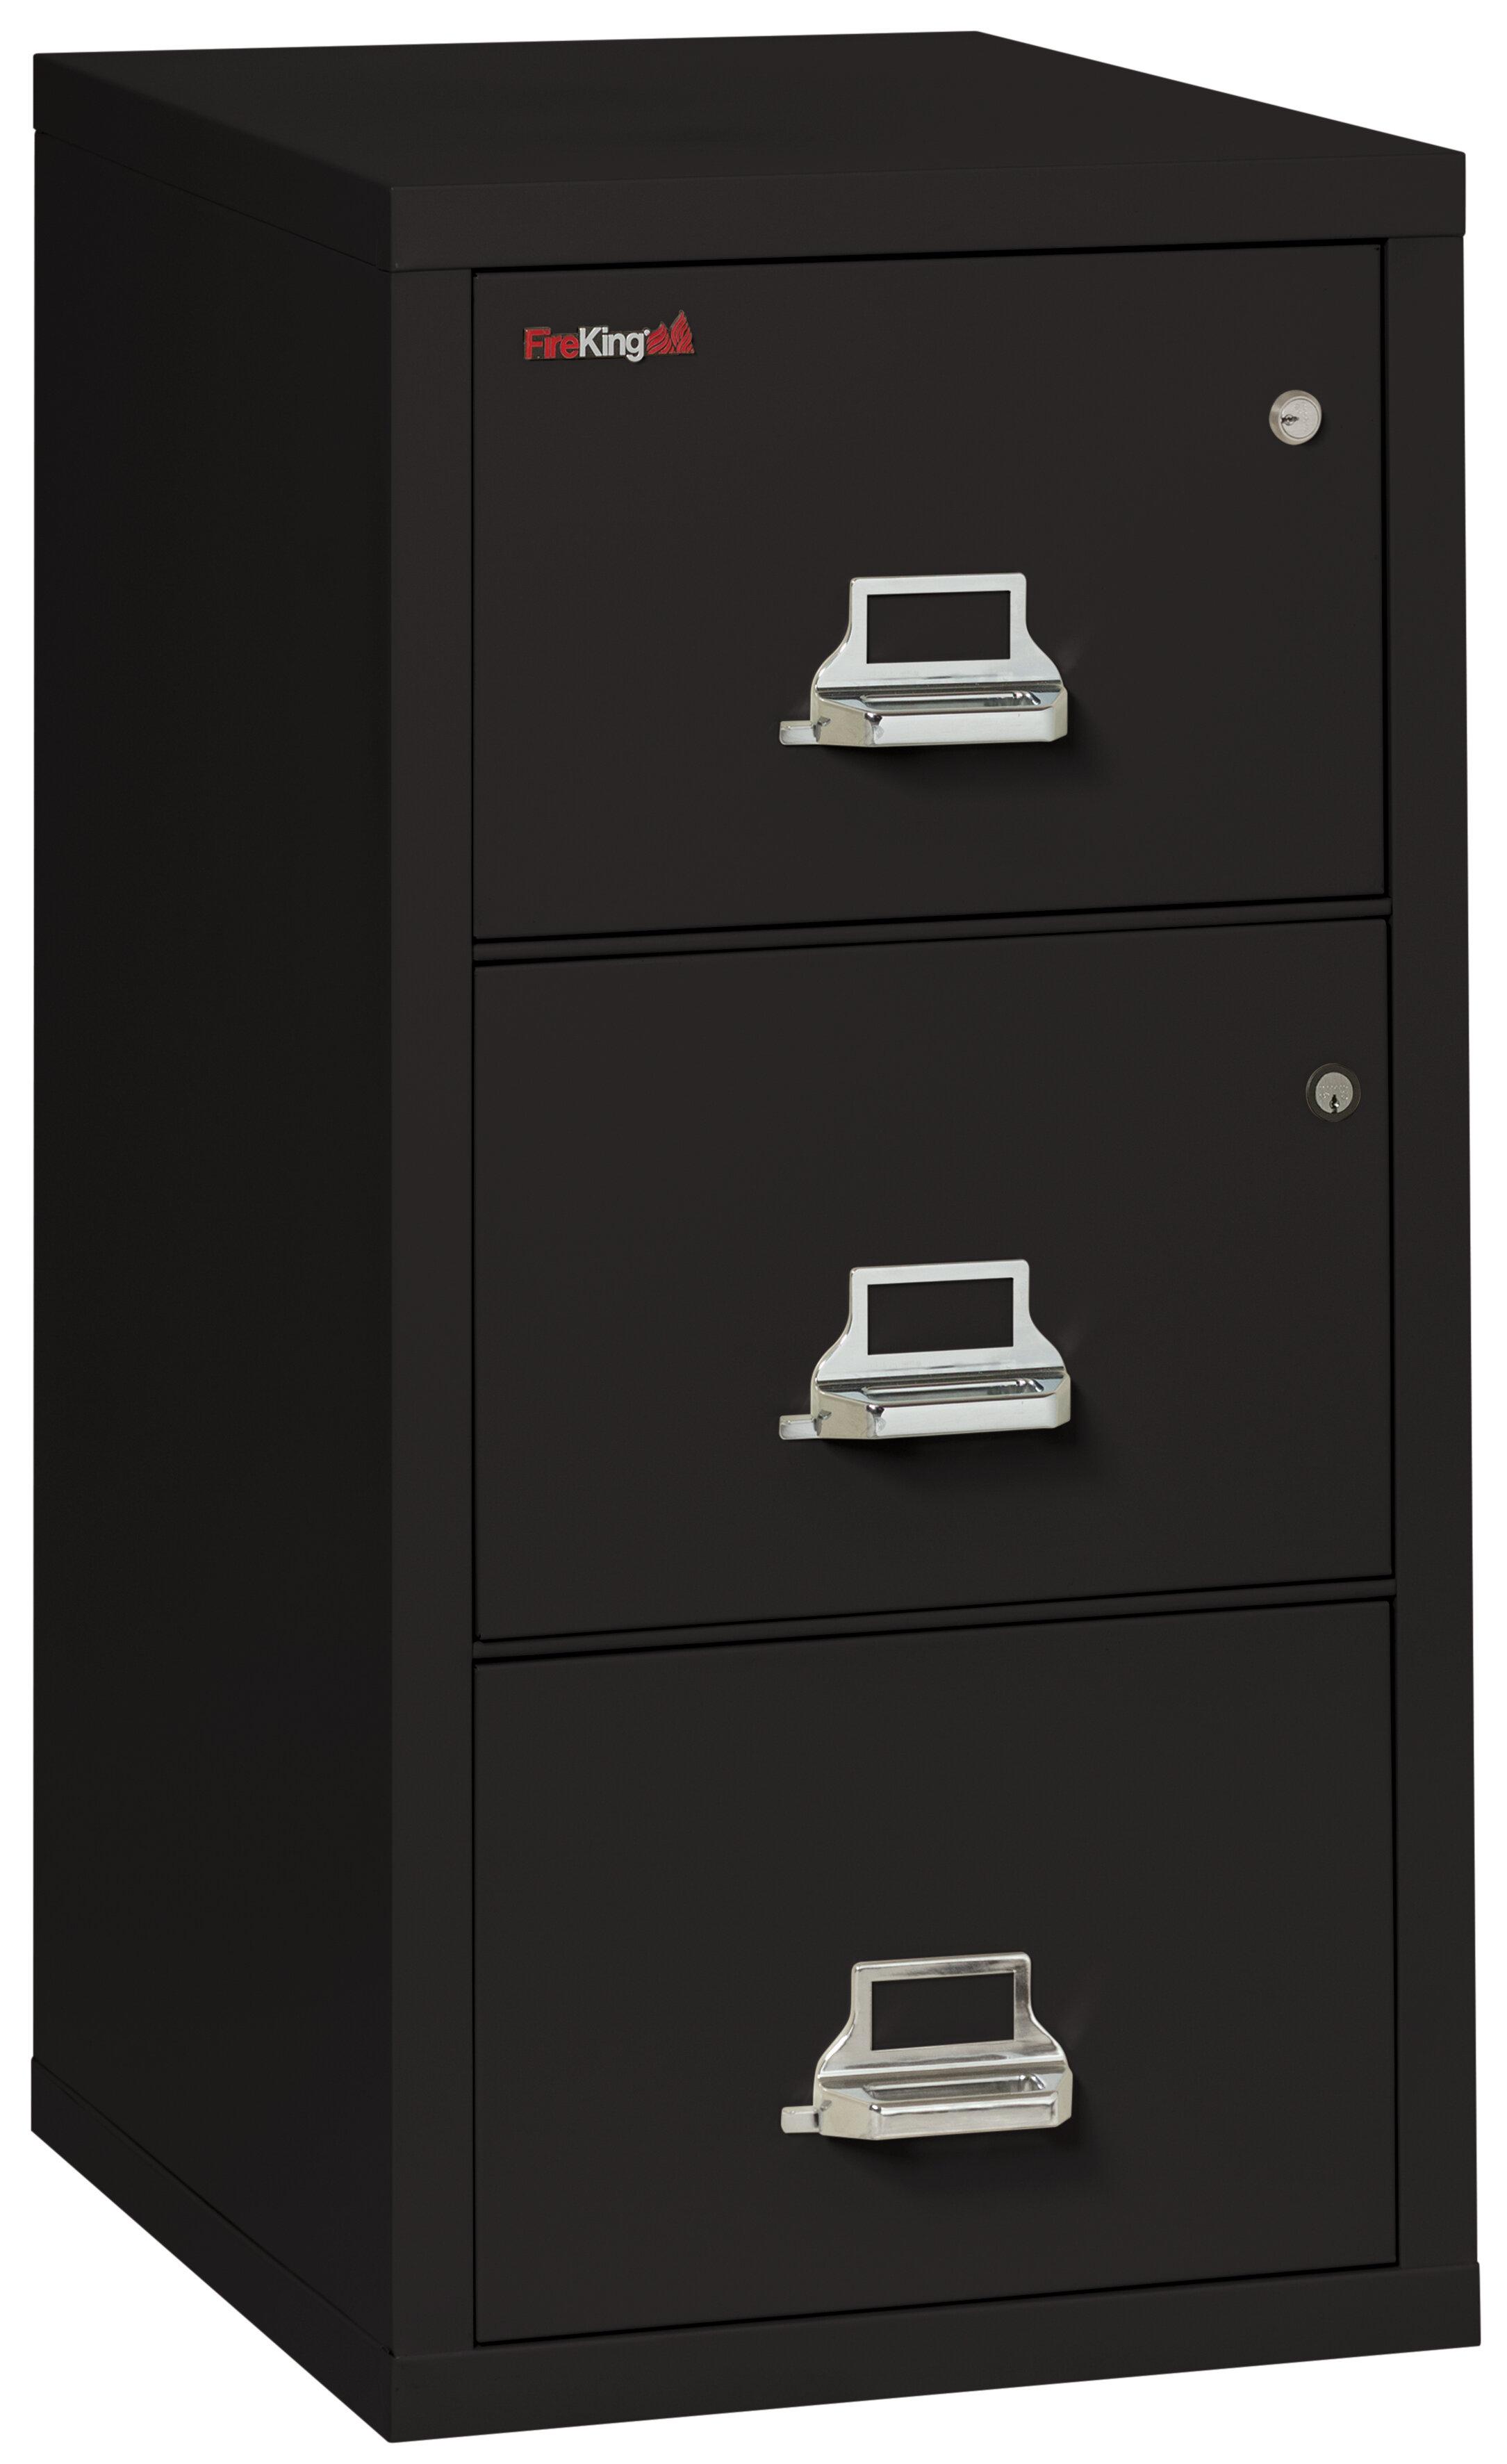 Fireking Legal Safe In A File Fireproof 3 Drawer Vertical Cabinet Wayfair